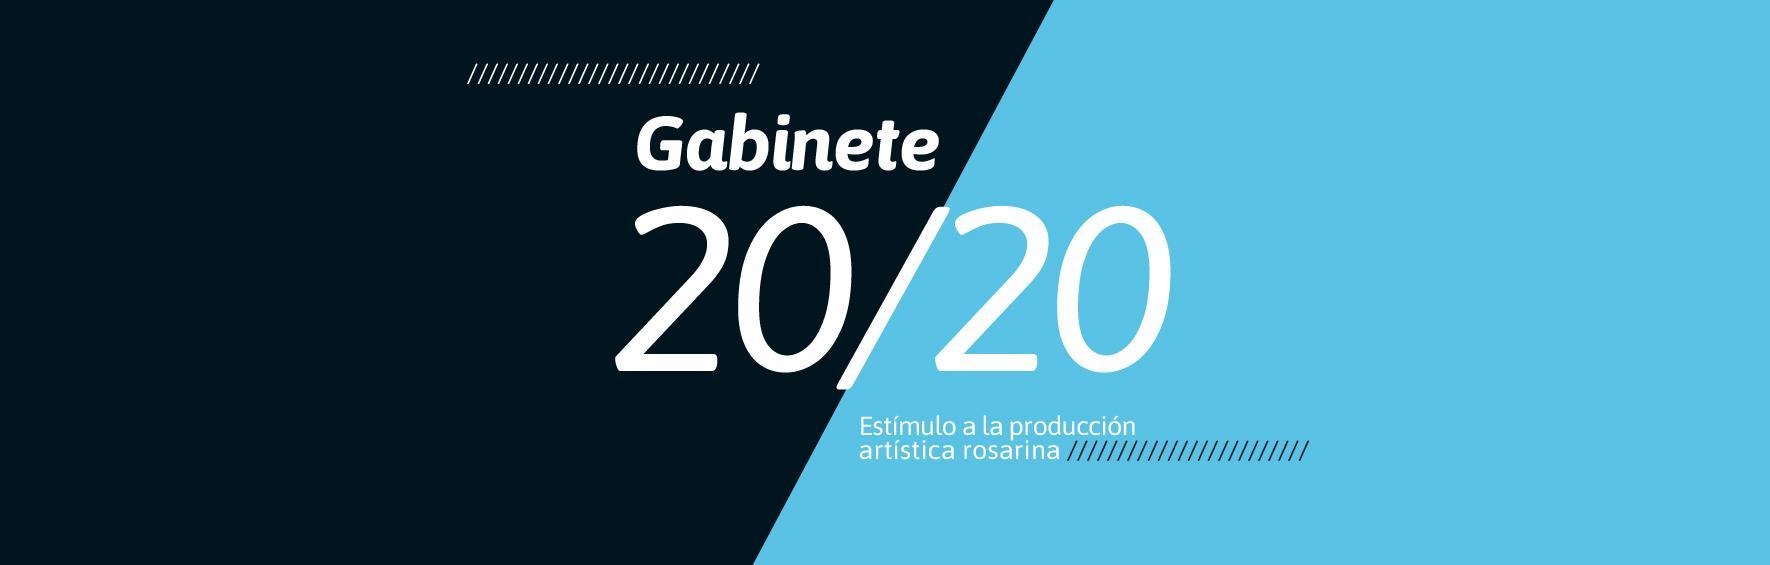 Gabinete 2020